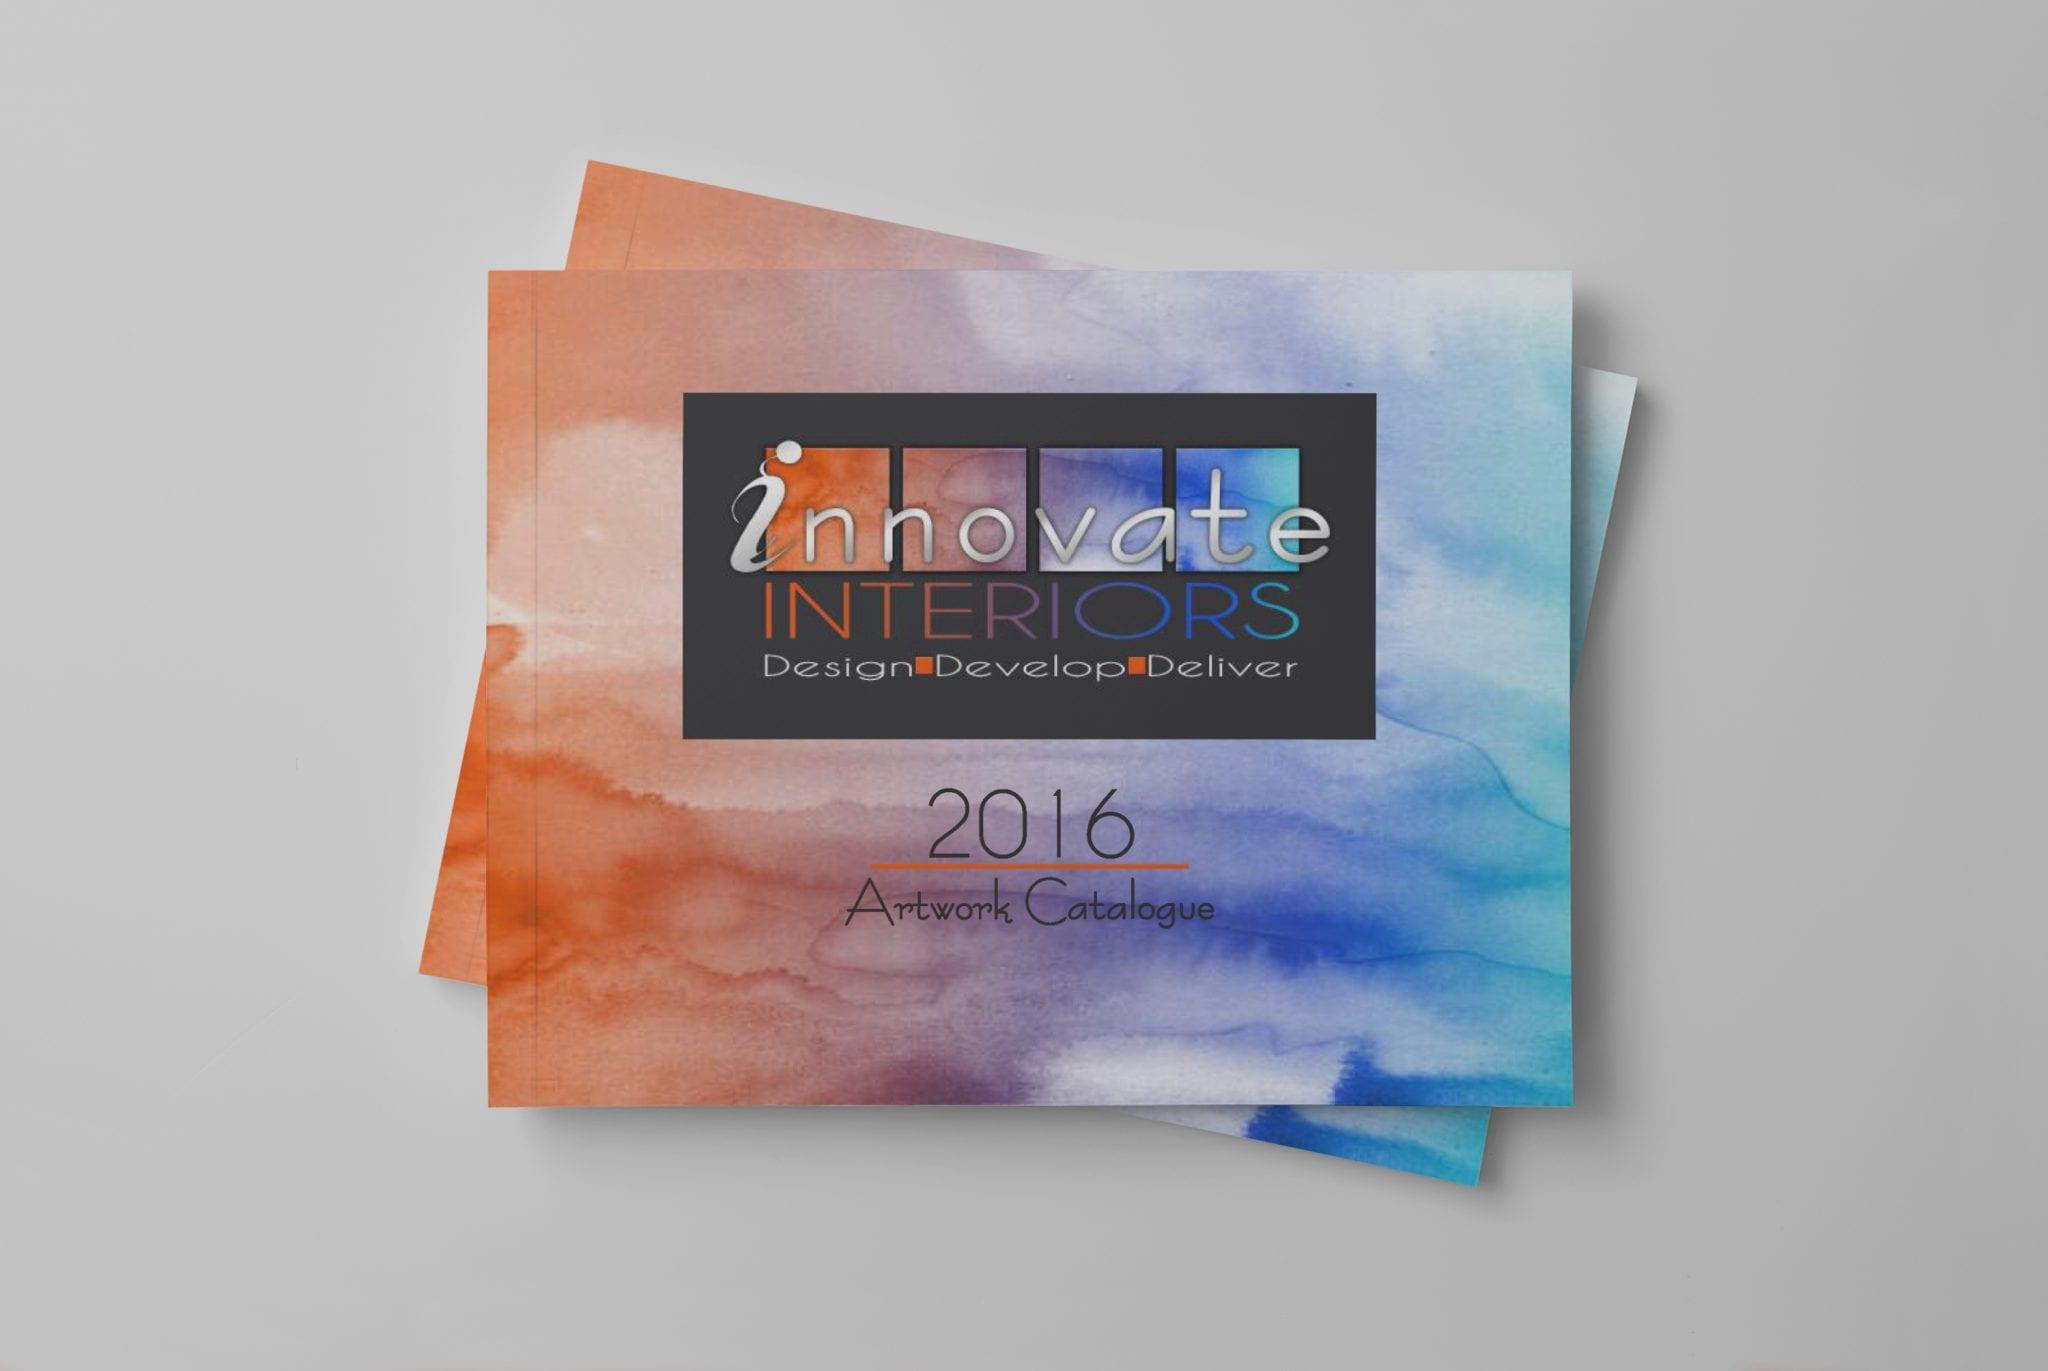 wholesale art frames | Framed Art | Wall Art Gold Coast | Wallpaper | Innovate Interiors